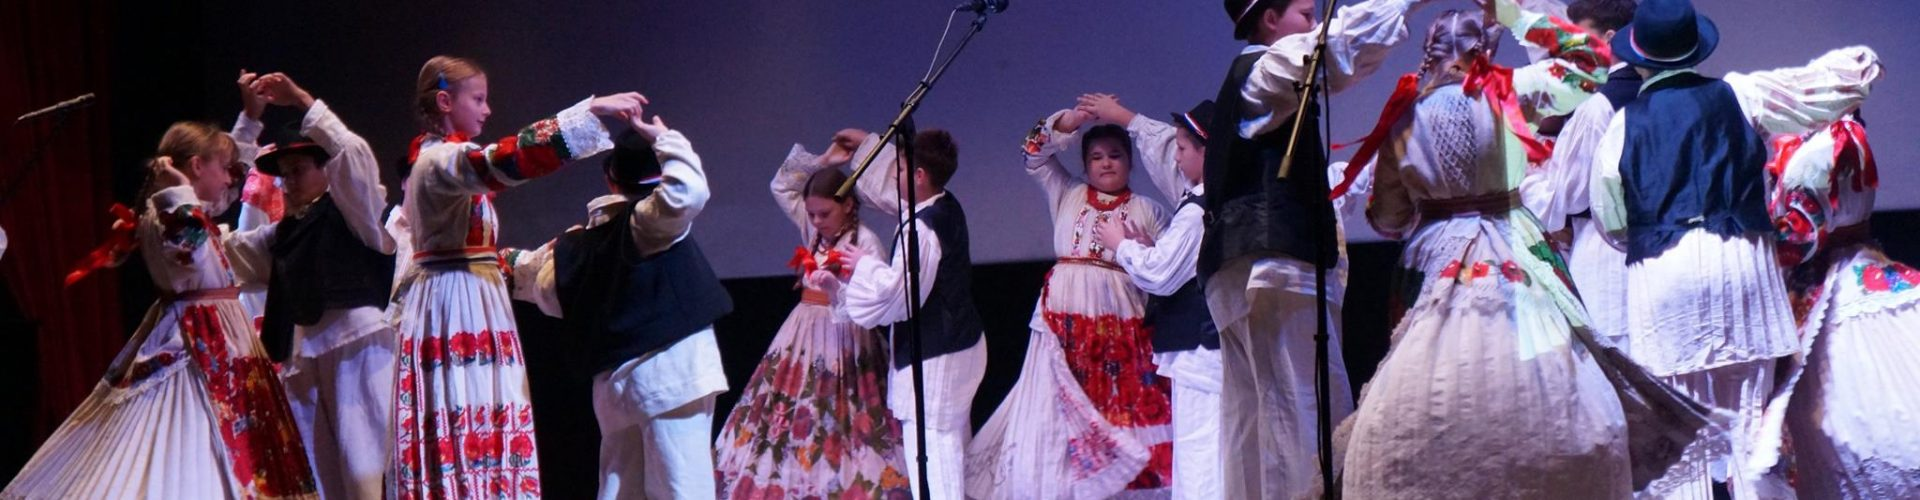 Dječja smotra folklora